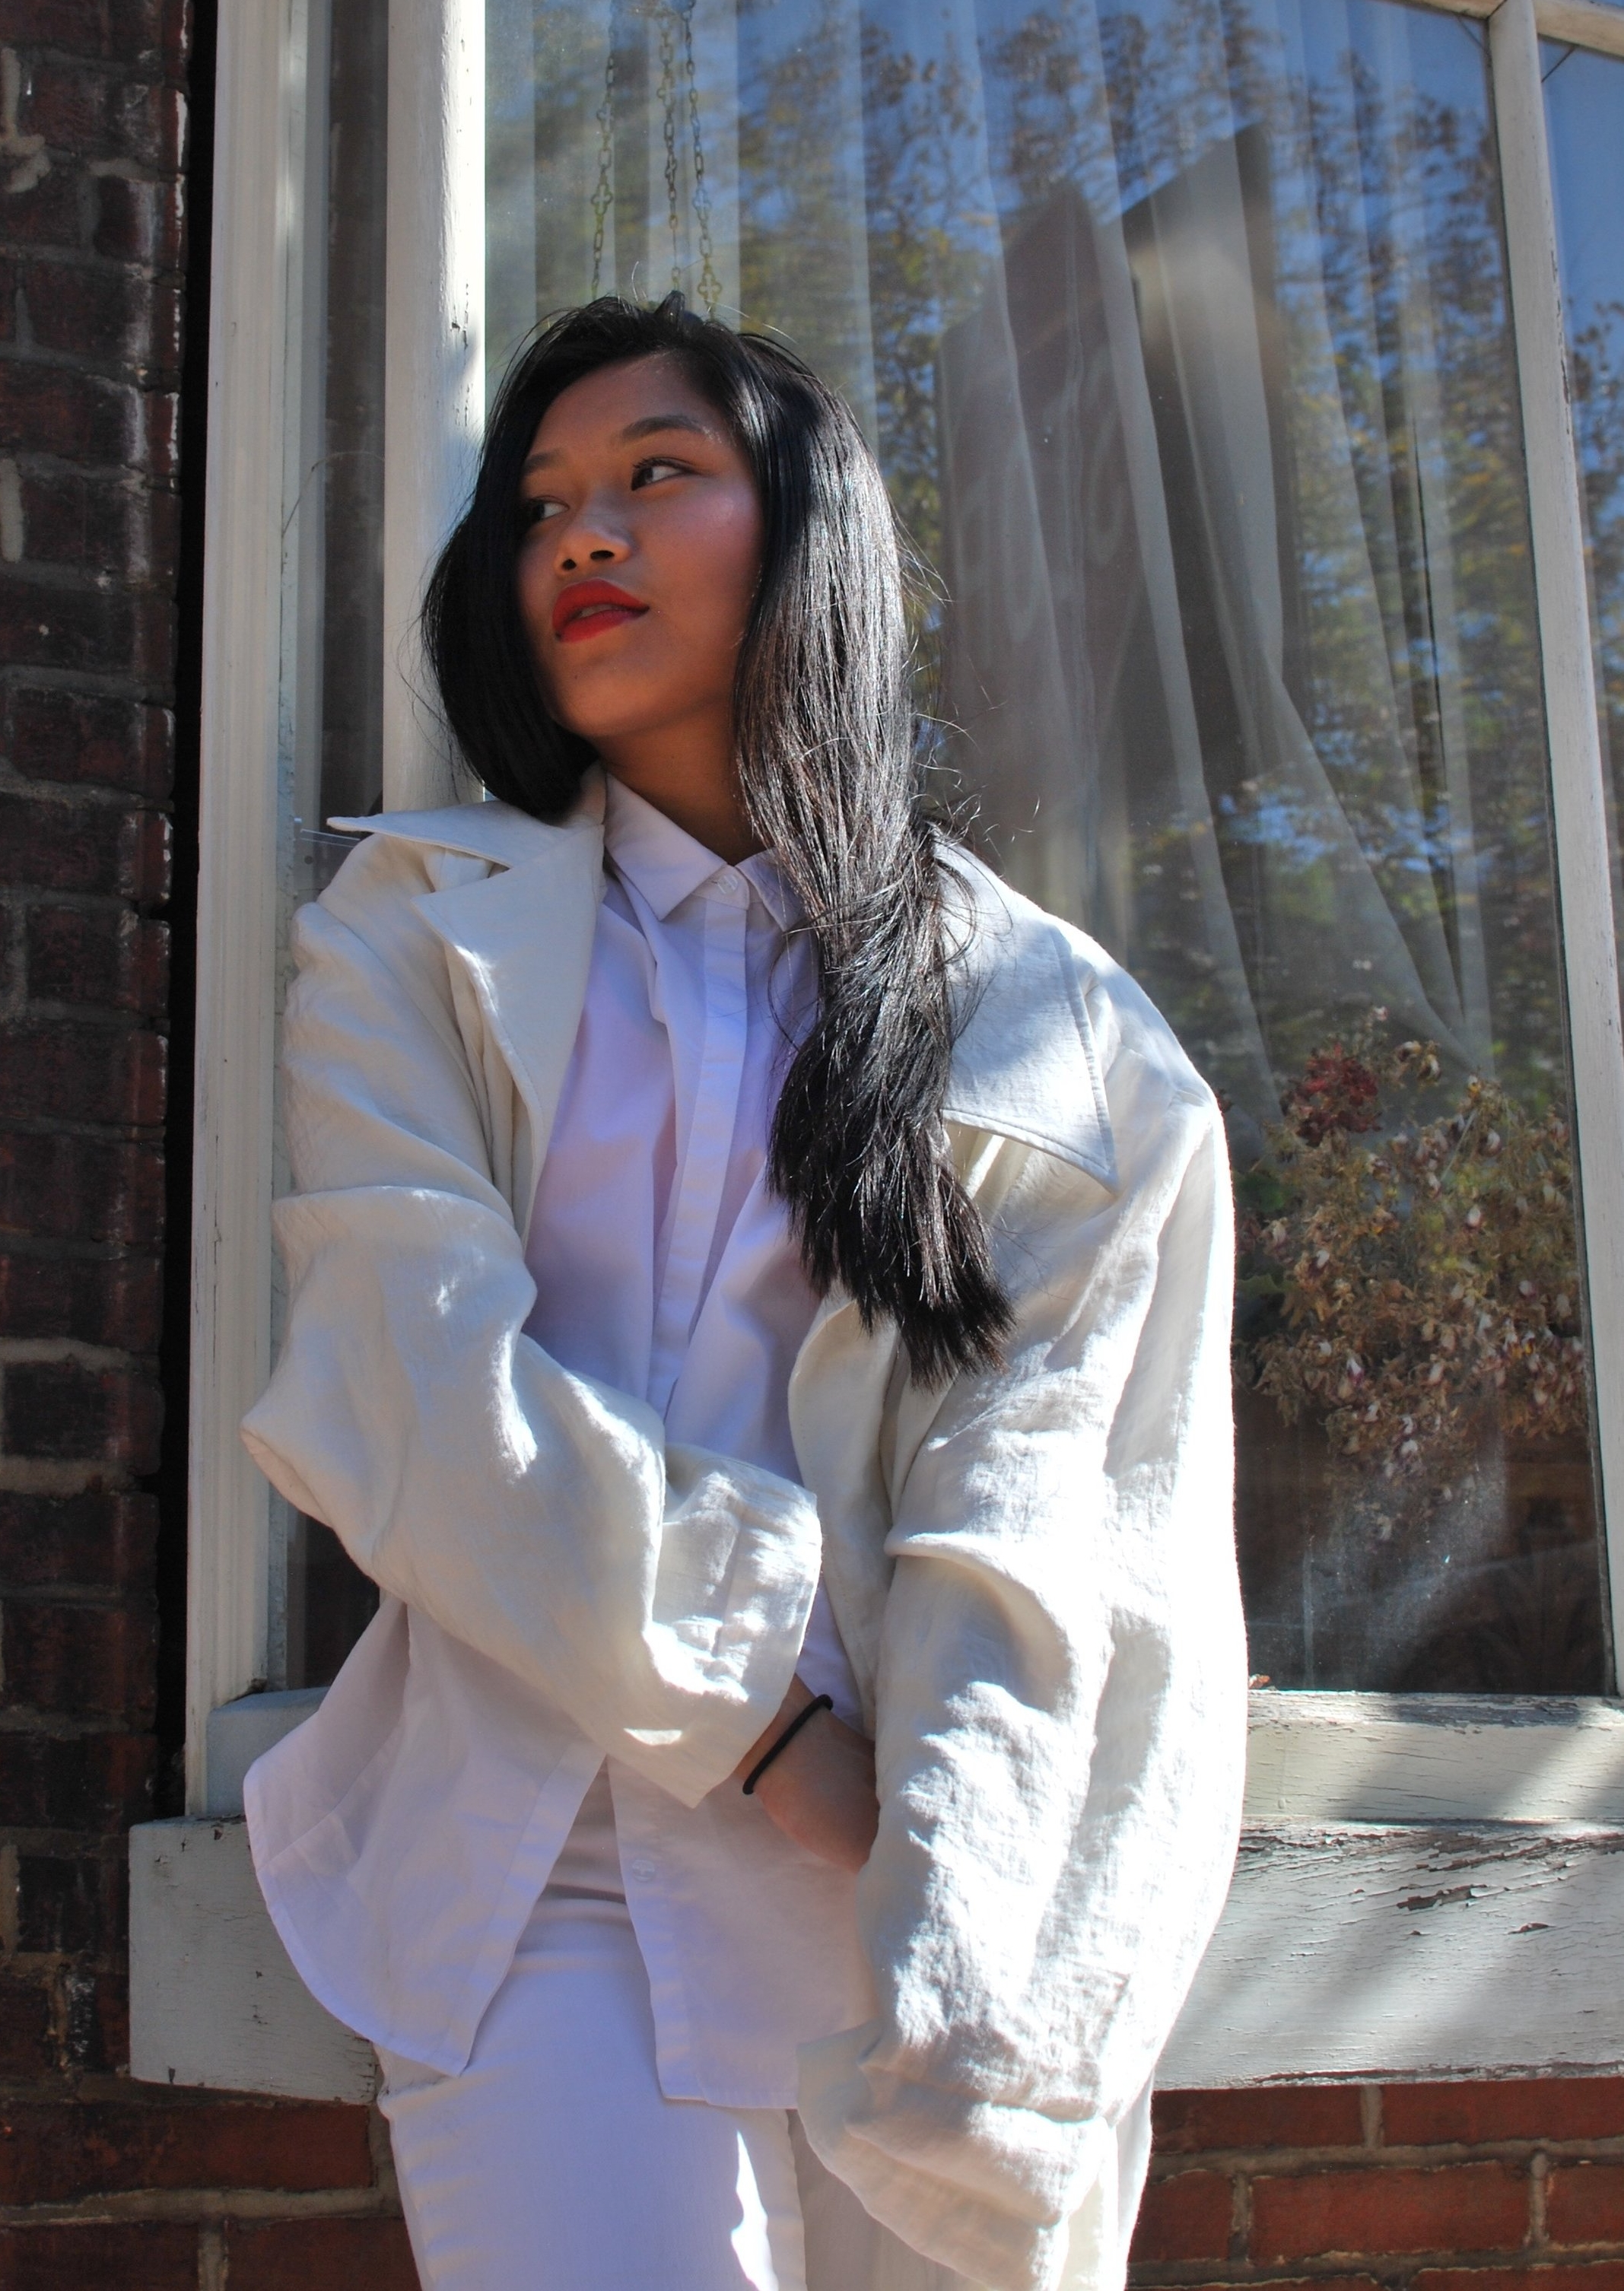 Actress, Model & Producer Jenna Lam Photographed by Sola Onitiri